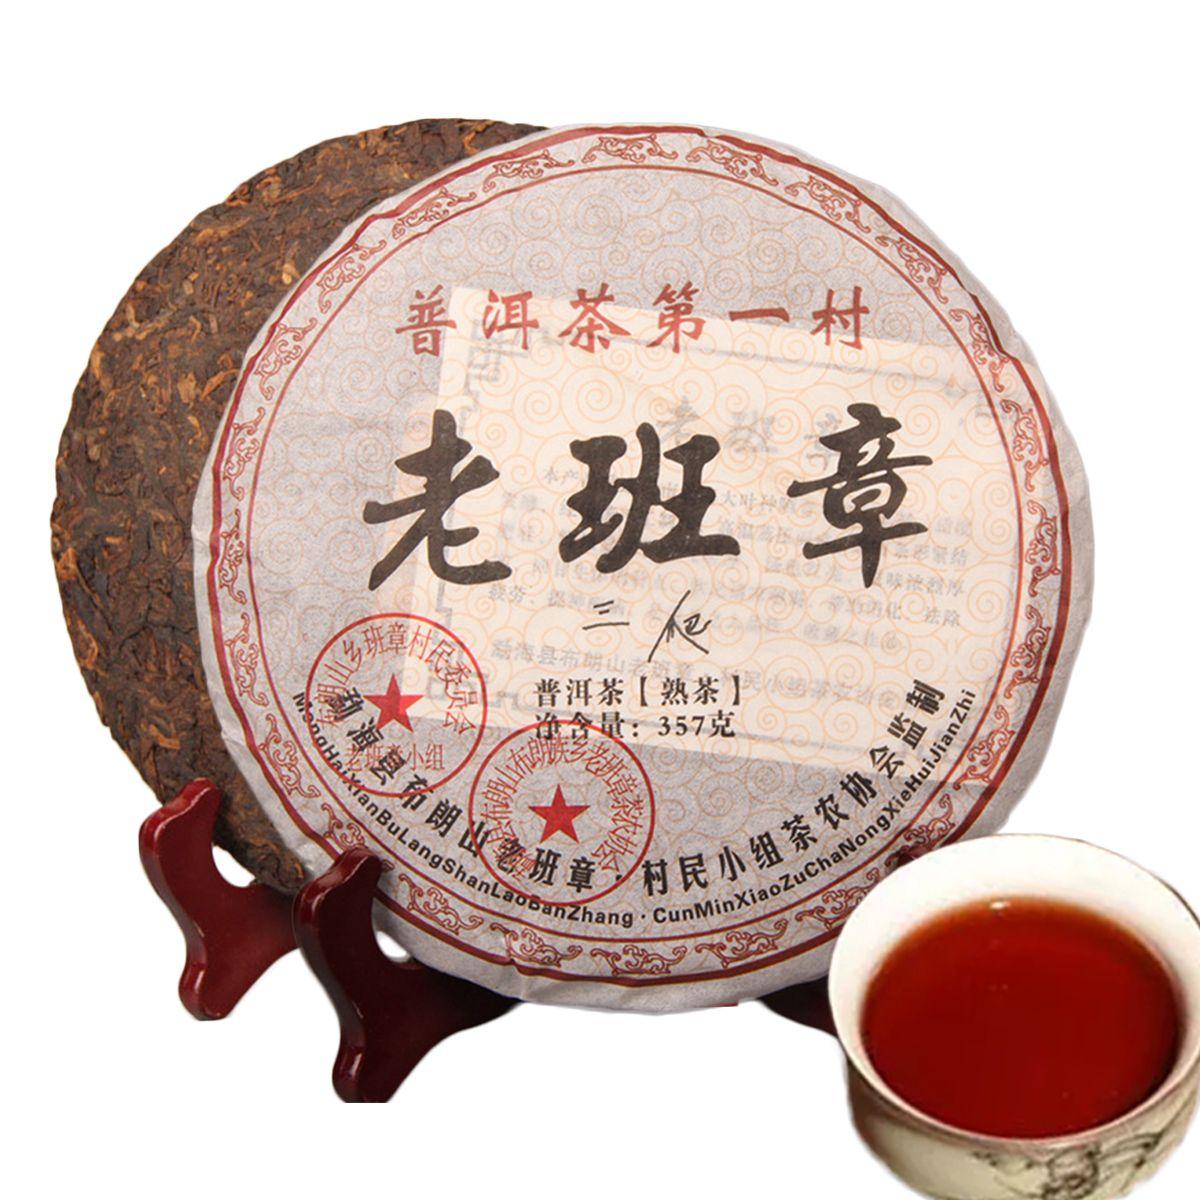 357g Olgun Puer Çay Yunnan Eski Banzhang Klasik Puer Çay Organik Pu'er Eski Ağacı Puer Doğal Pu erh Siyah Puerh Çay Kek Pişmiş